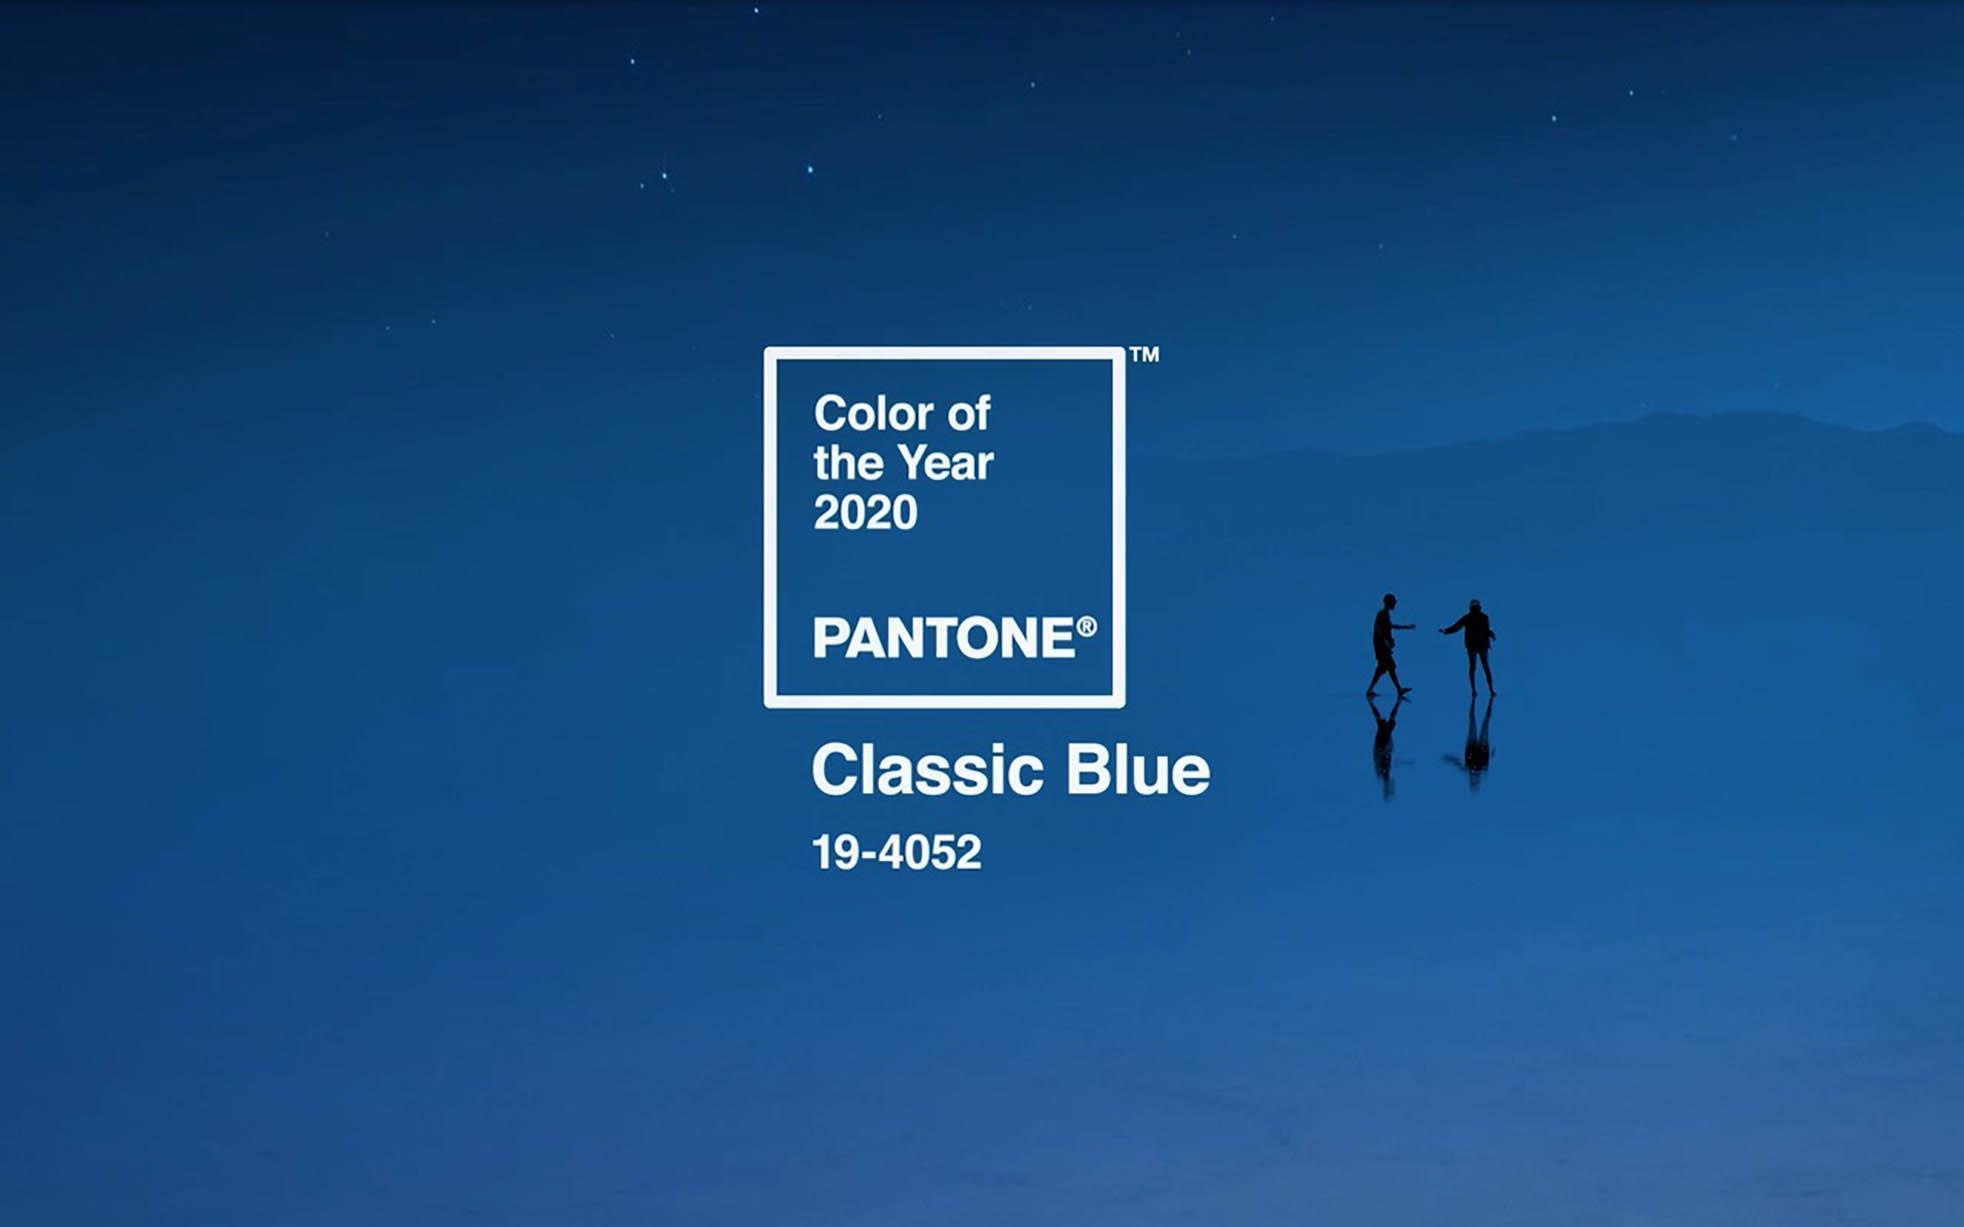 pantone classic blue - acrediteco